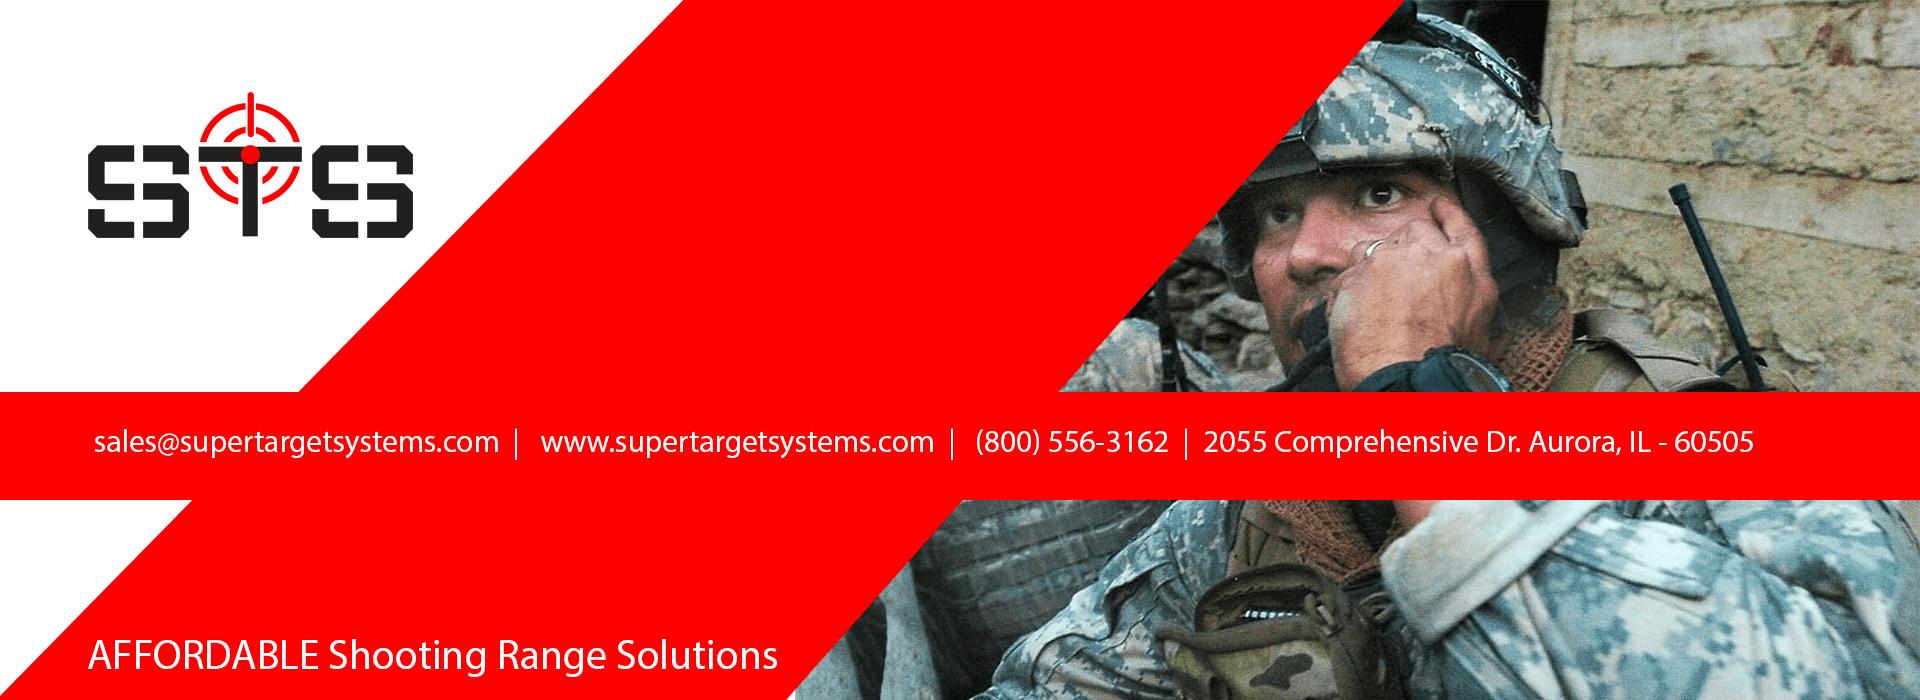 Contact Us Slider 05102018